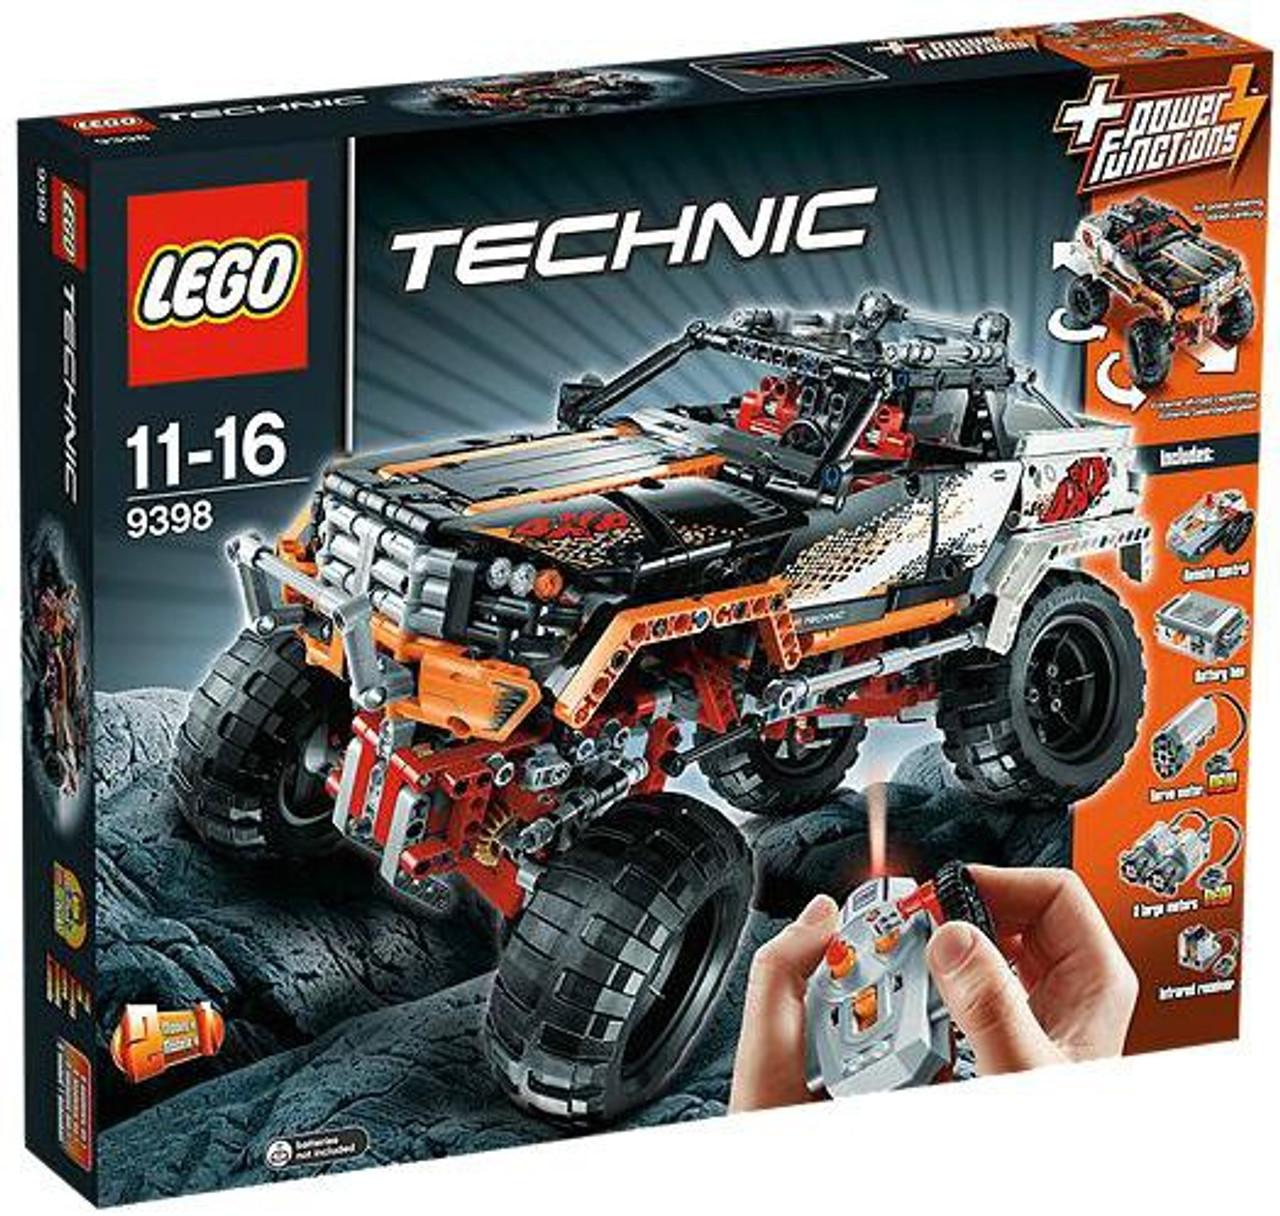 LEGO Technic Power Functions 4x4 Crawler Set #9398